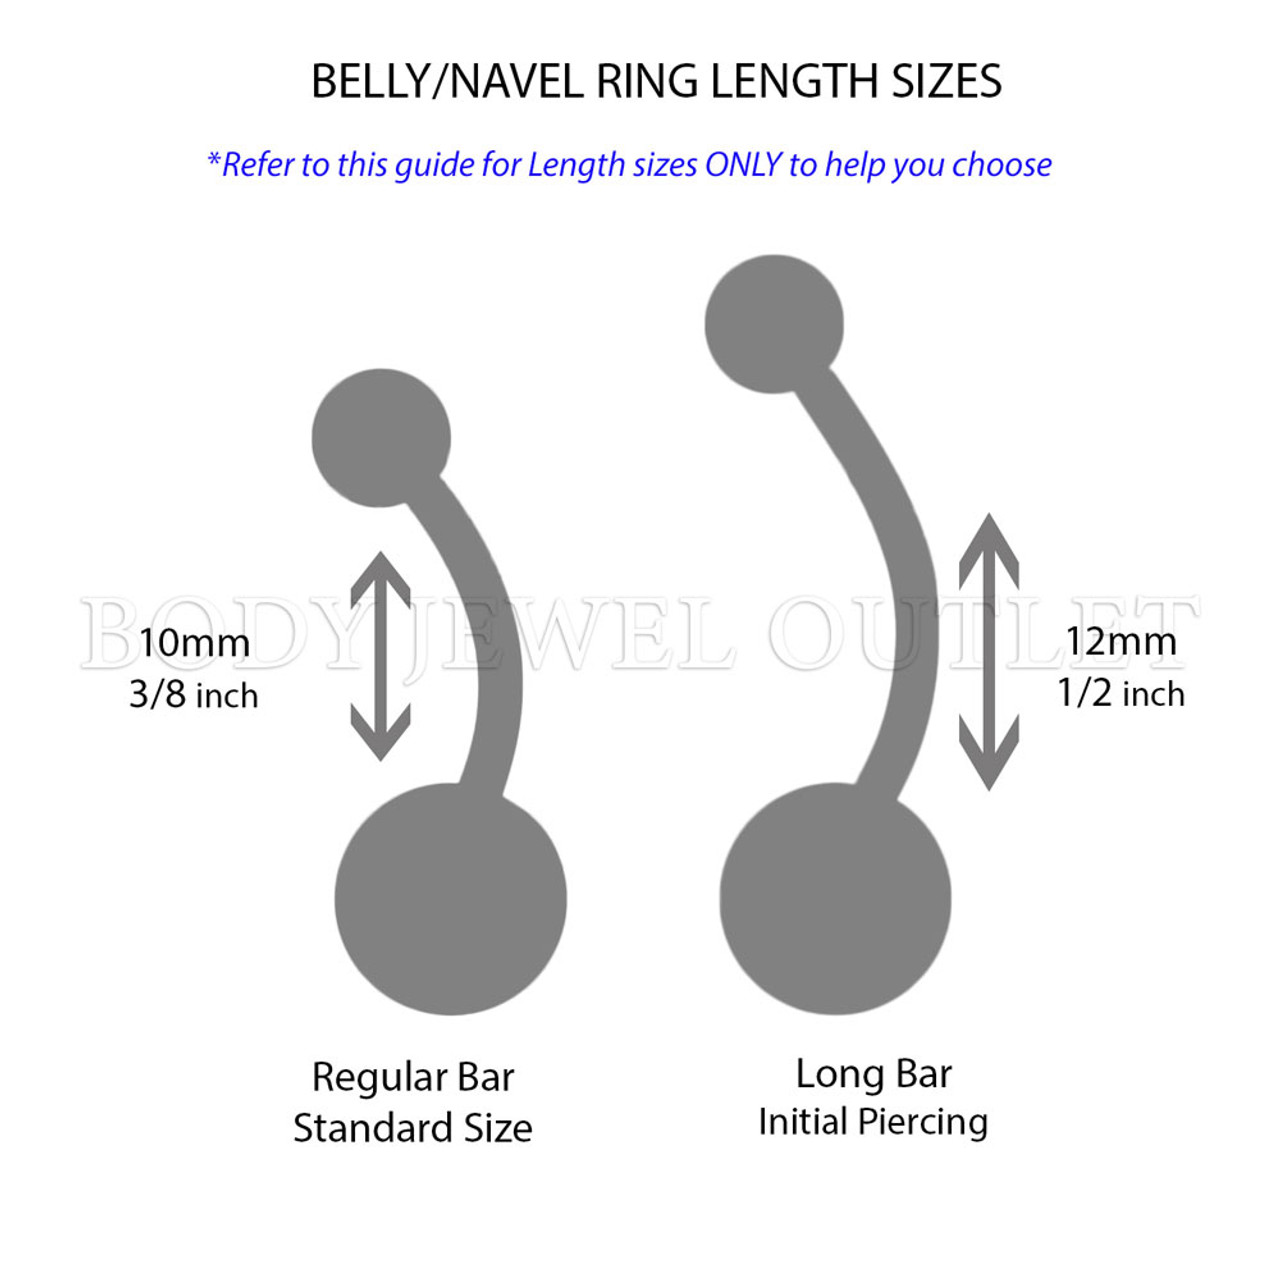 White GLOW in the Dark Acrylic Balls - Bio Flex Acrylic Belly/Navel Ring Piercing - 14 Gauge (1 Piece)